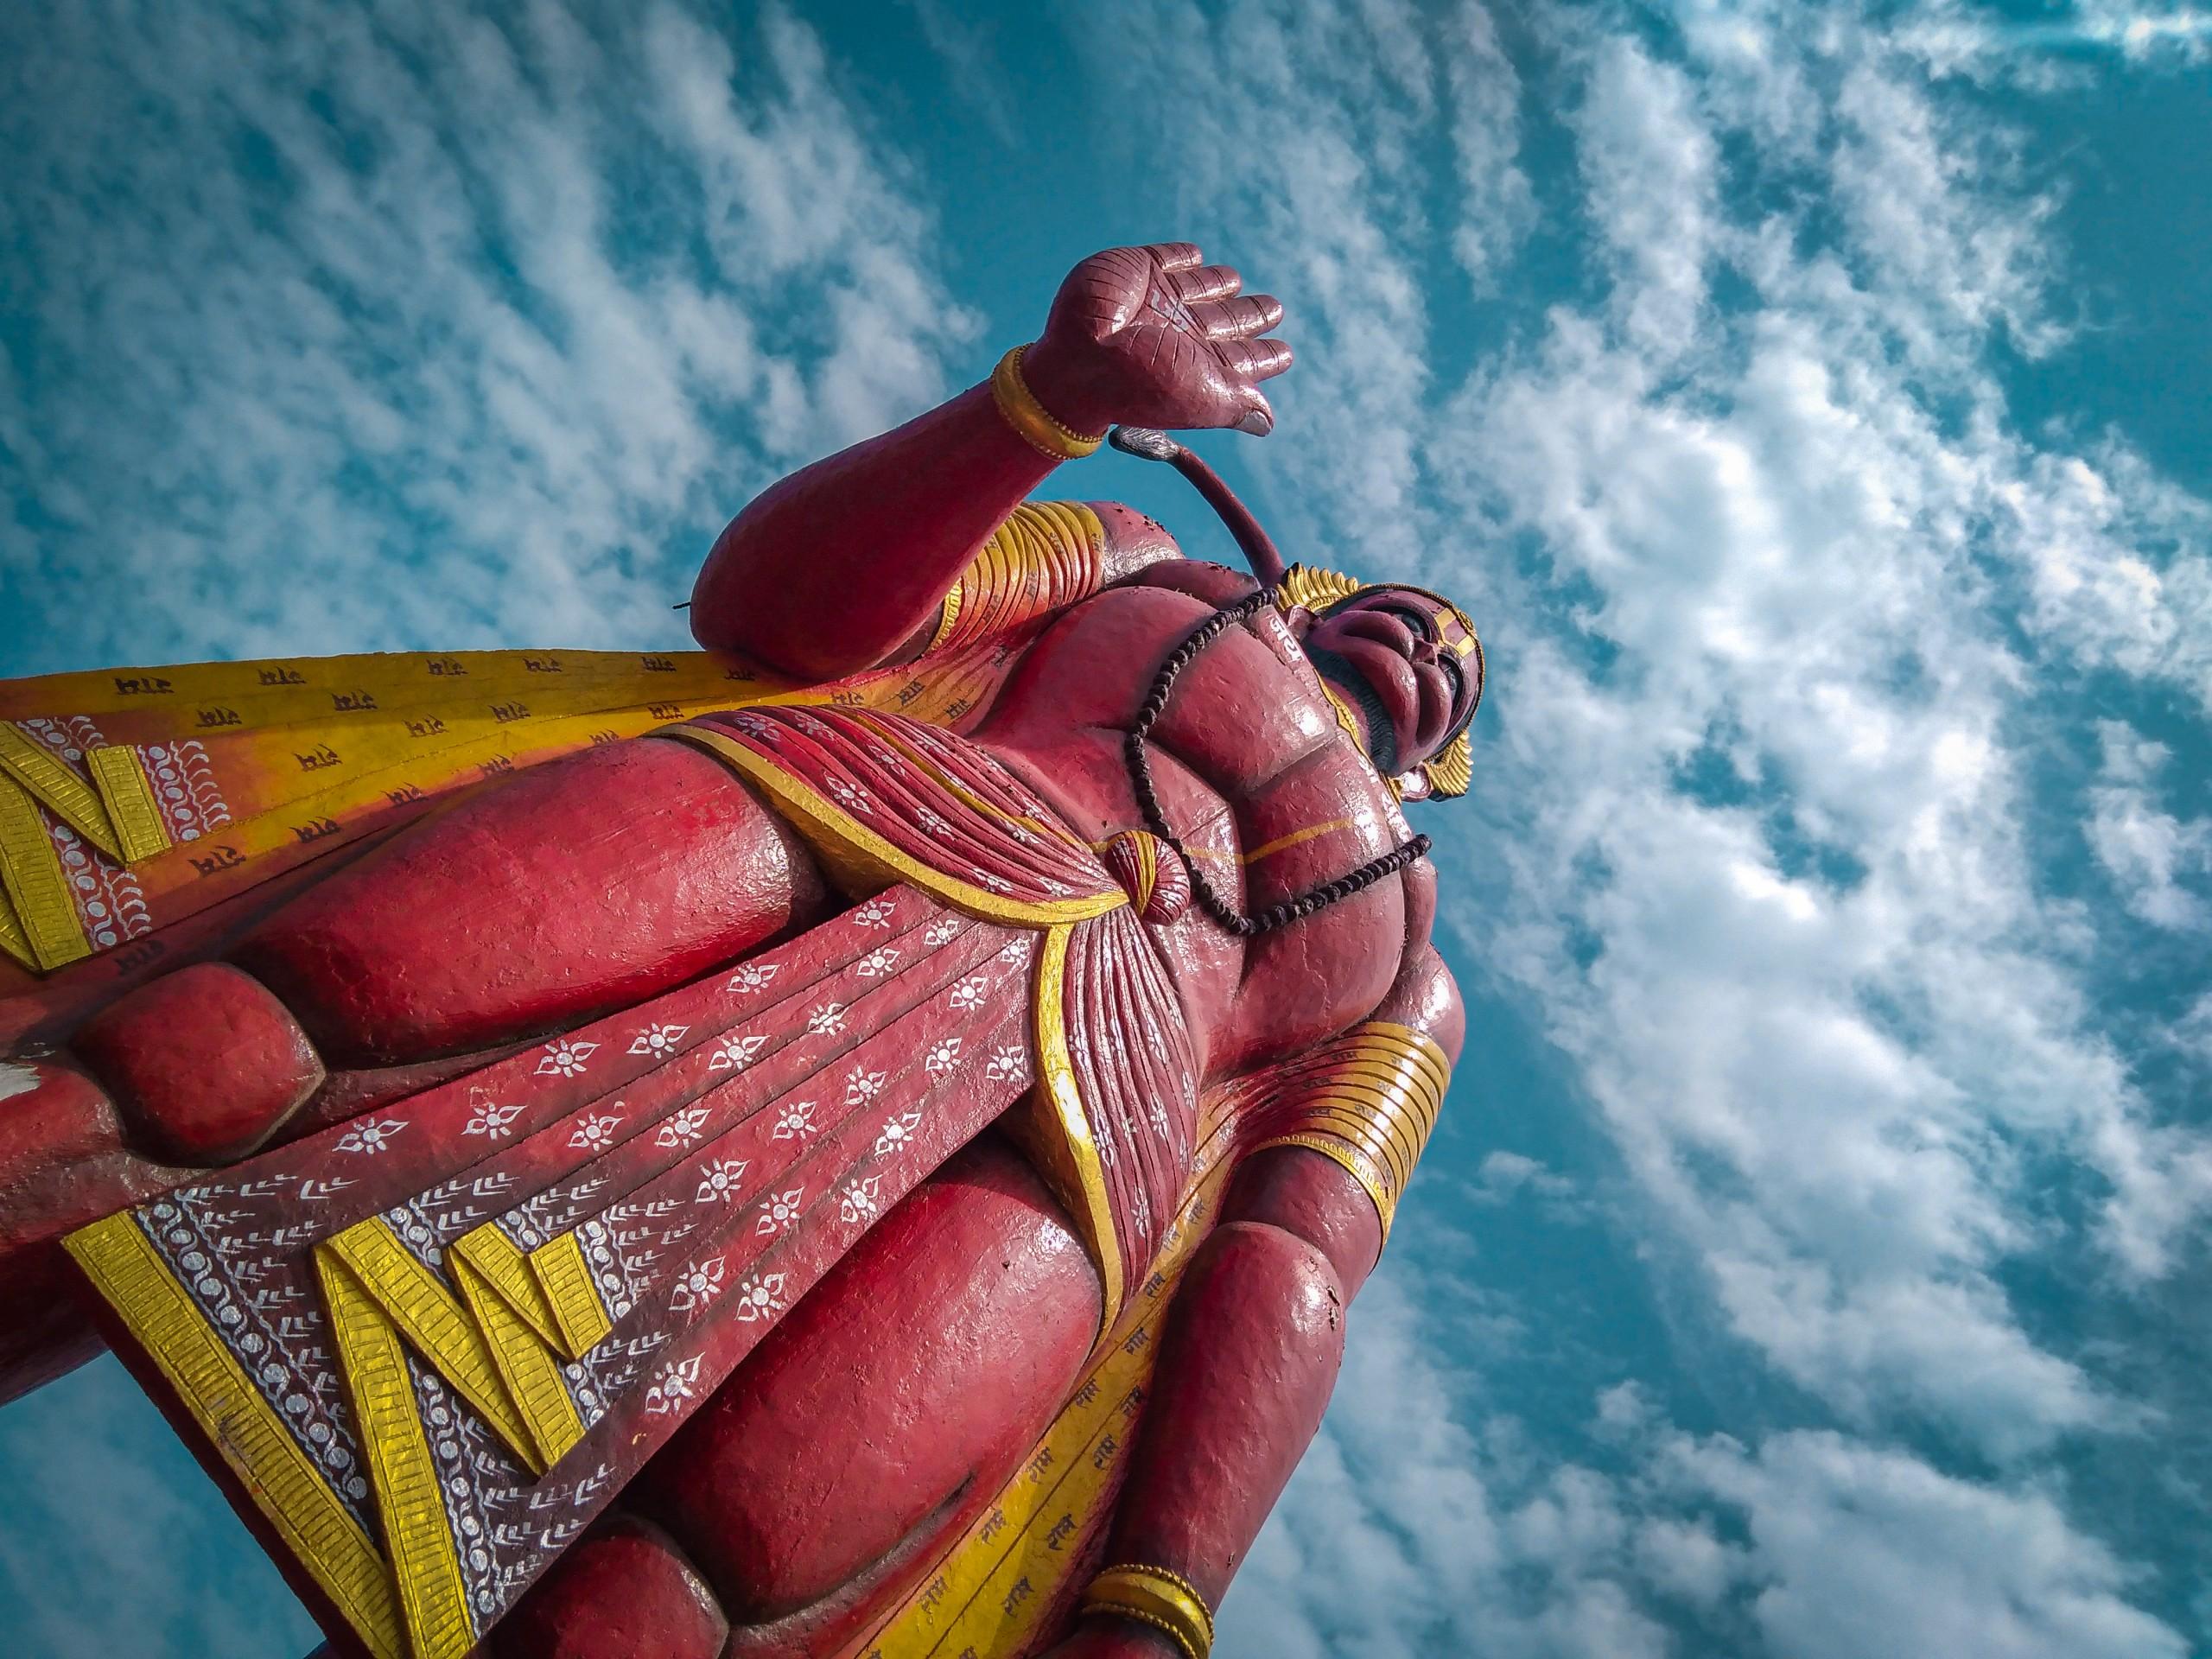 A figurine of Lord Hanuman